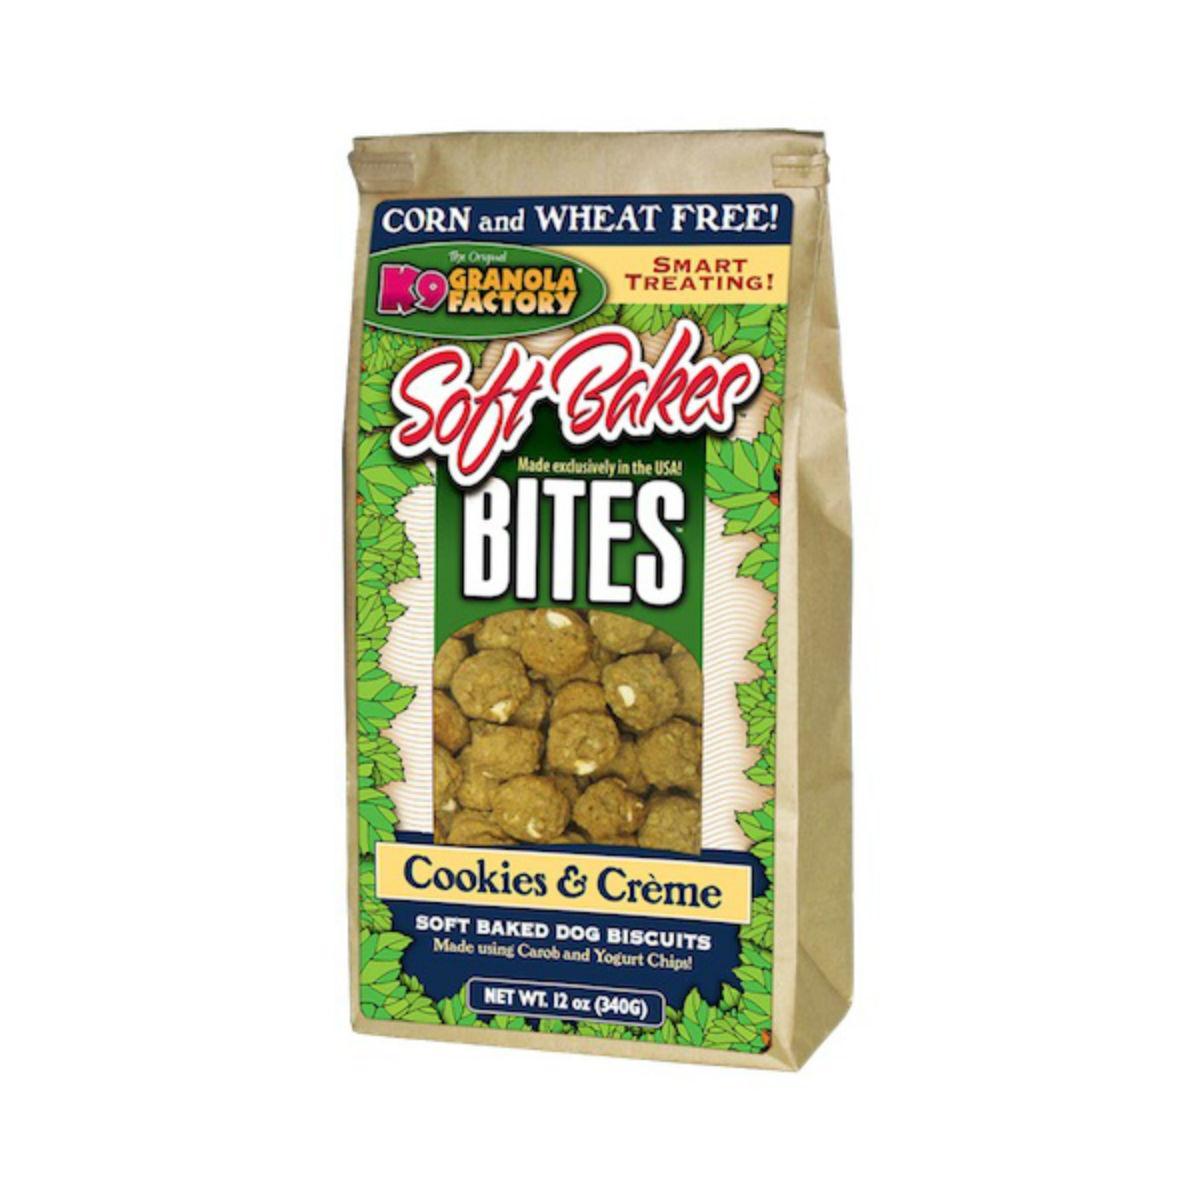 K9 Granola Factory Soft Bakes Bites Dog Treat - Cookies & Creme  w/Carob and Yogurt Chips